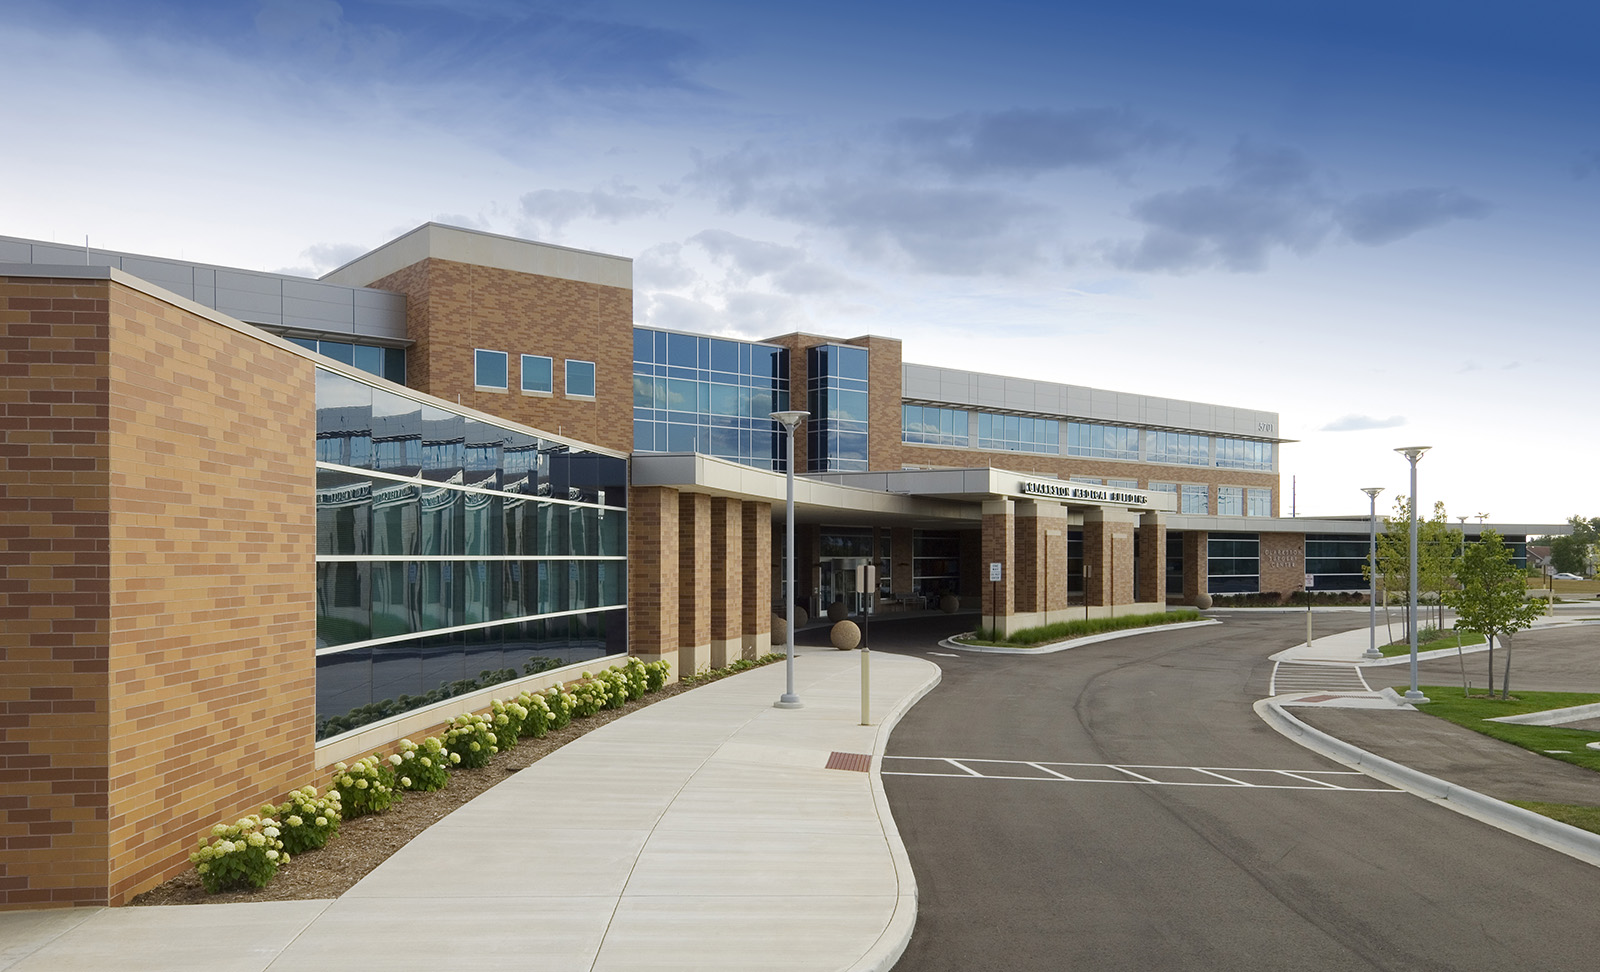 clarkston-medical-building-exterior